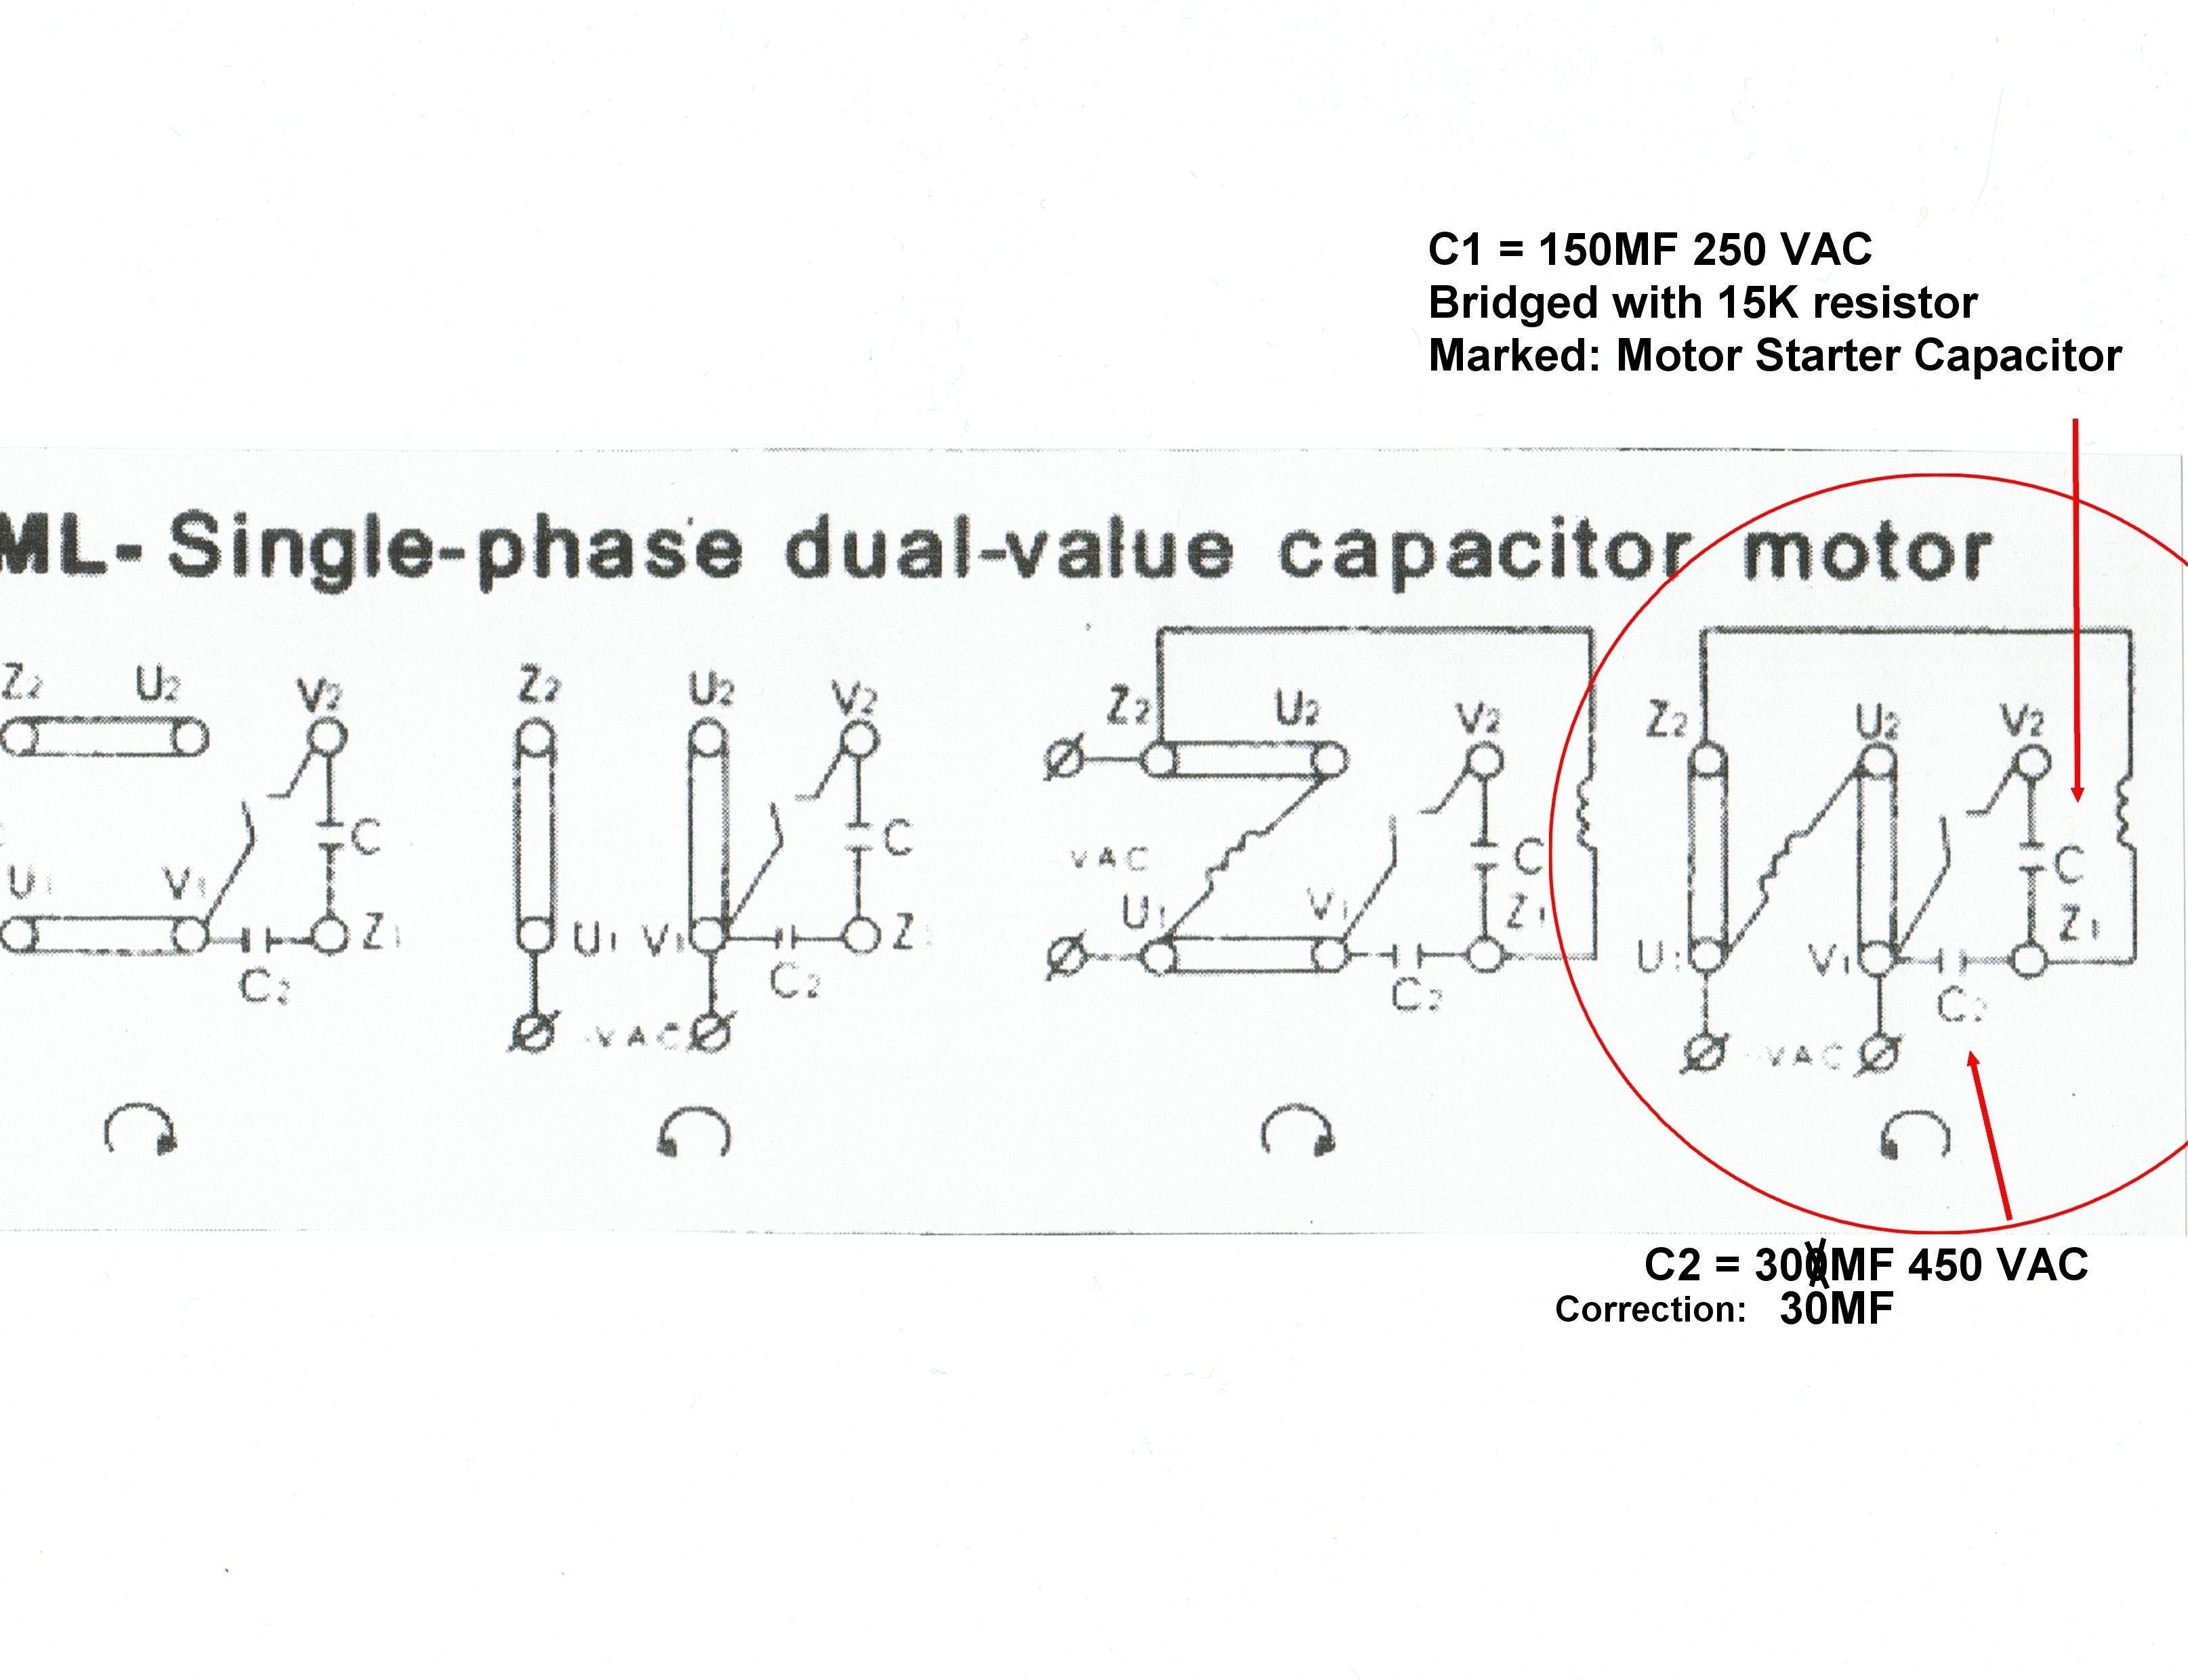 Wiring Diagram For 3 Phase Ac Motor Diagram Diagramtemplate Diagramsample Baldor Diagrama De Circuito Circuito